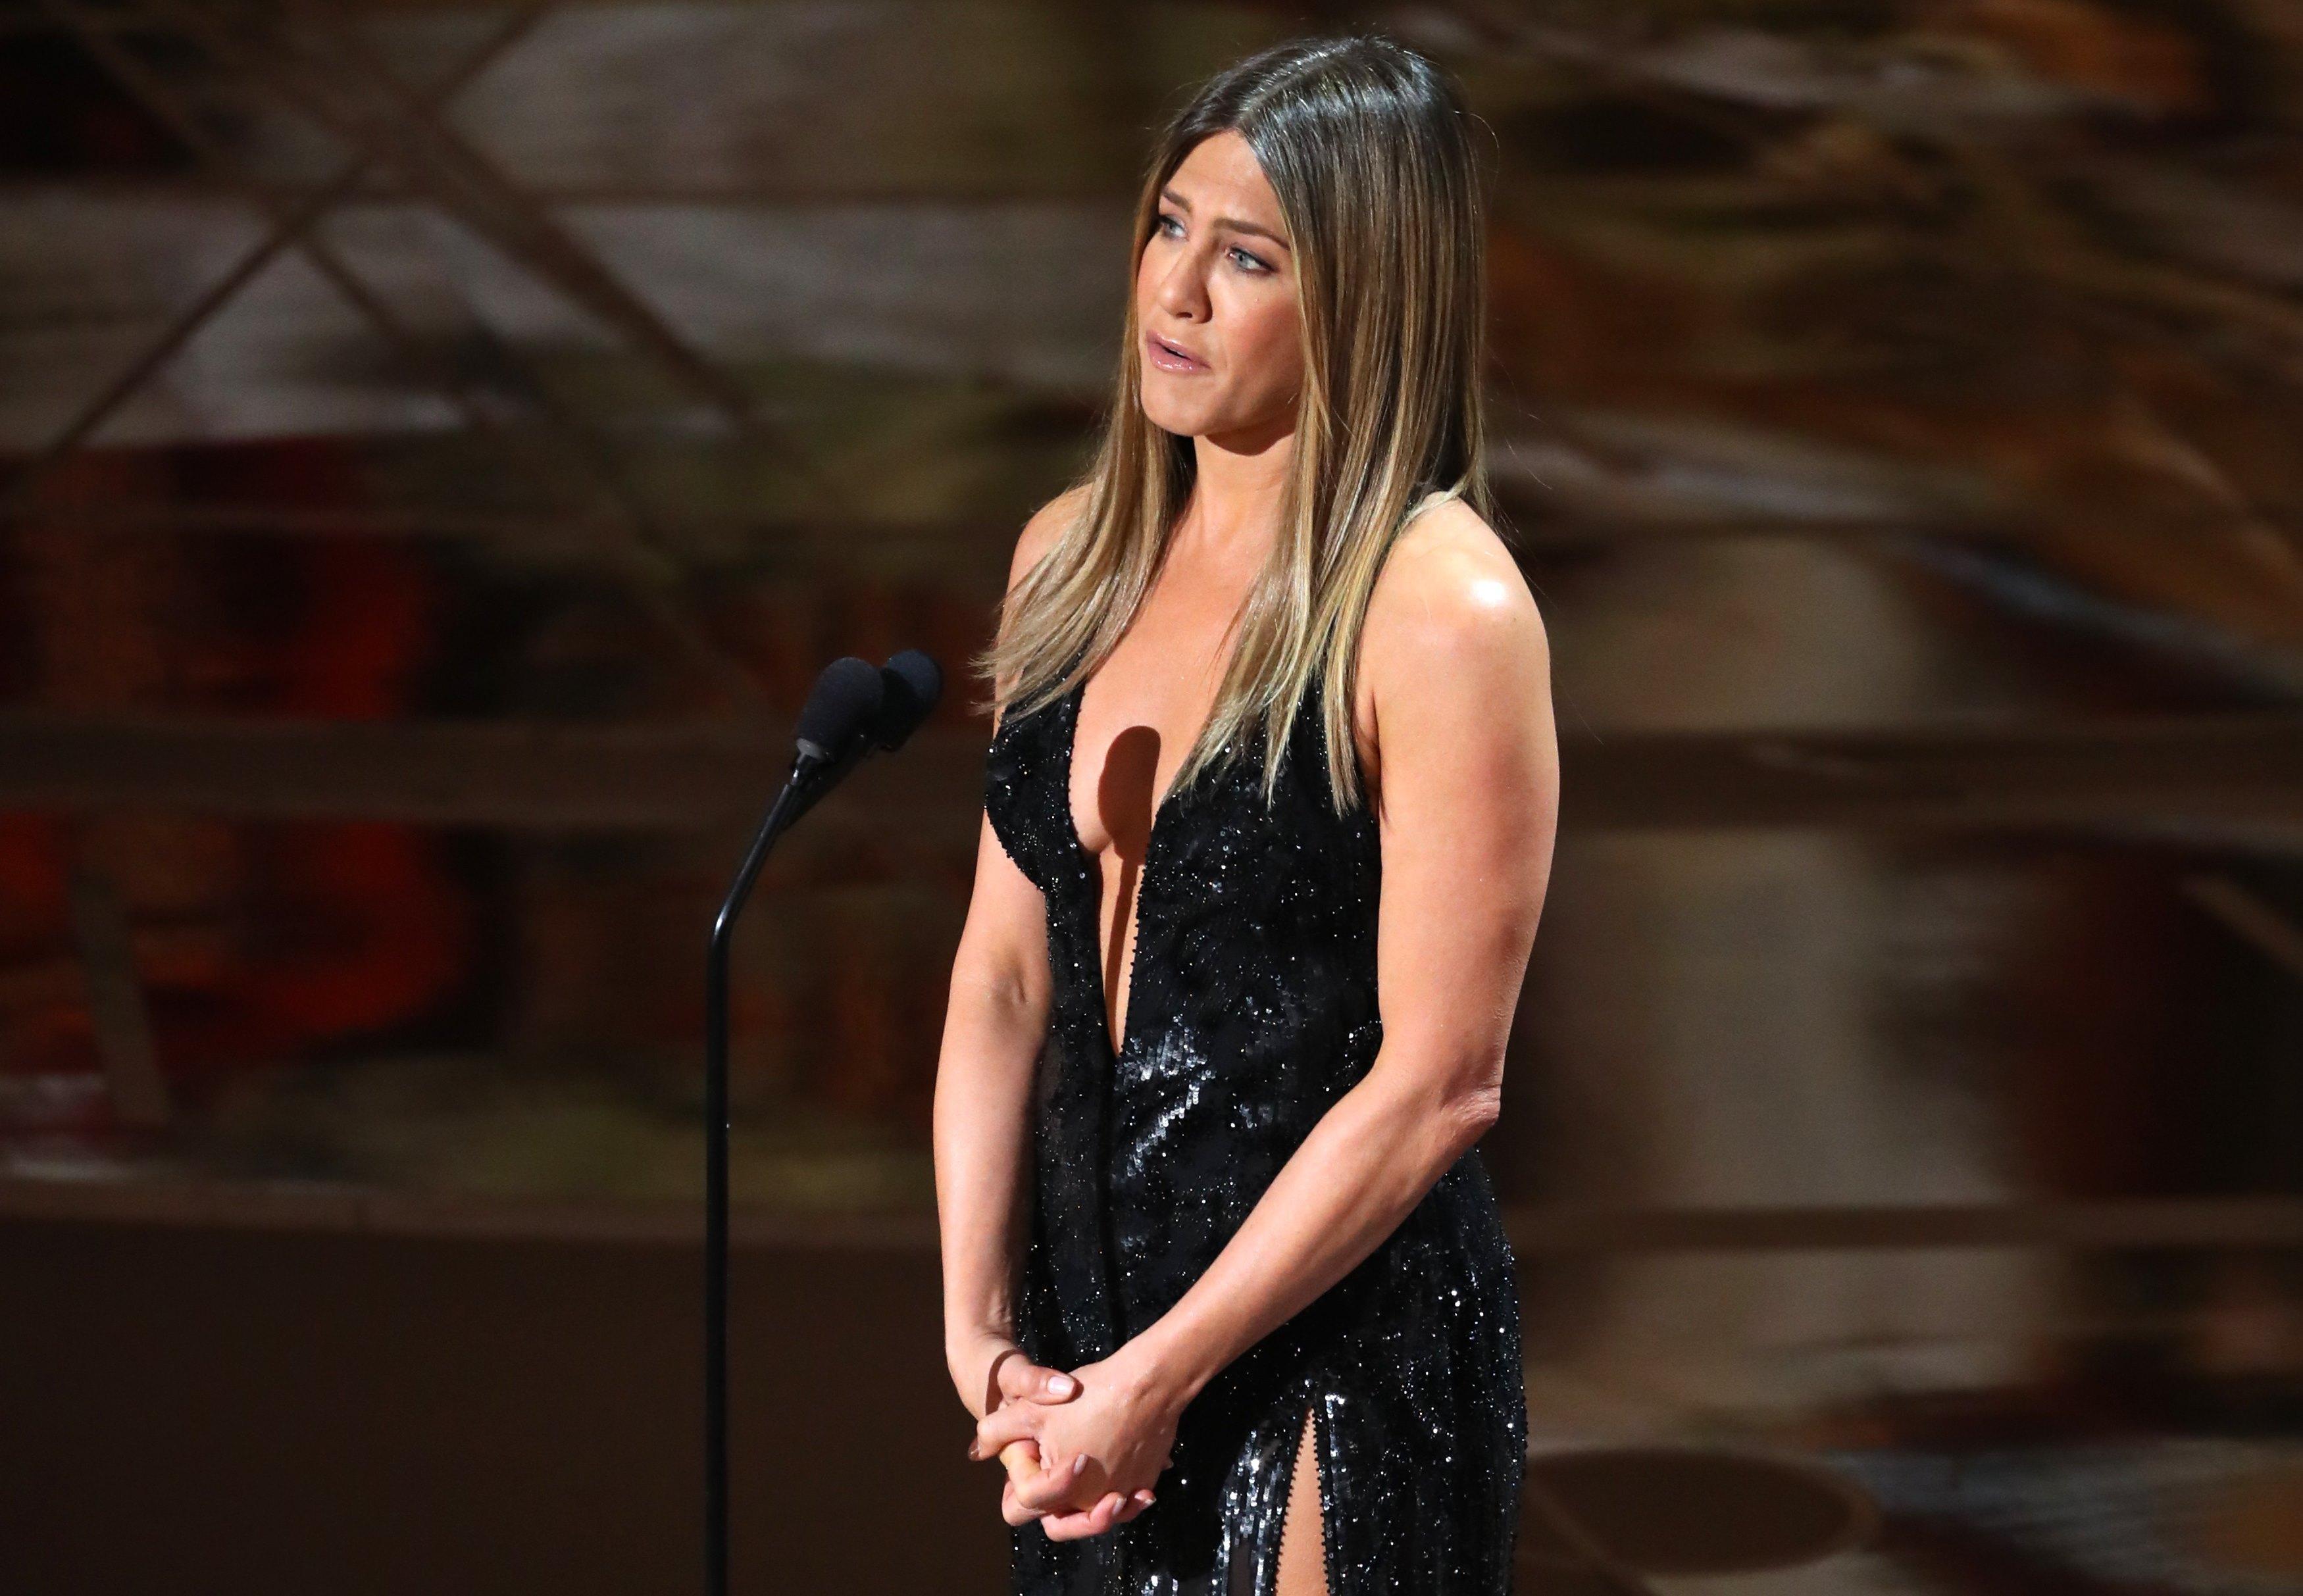 eba4b2b133e3 Jennifer Aniston says Vicky from Chicago can keep sunglasses - CBS News